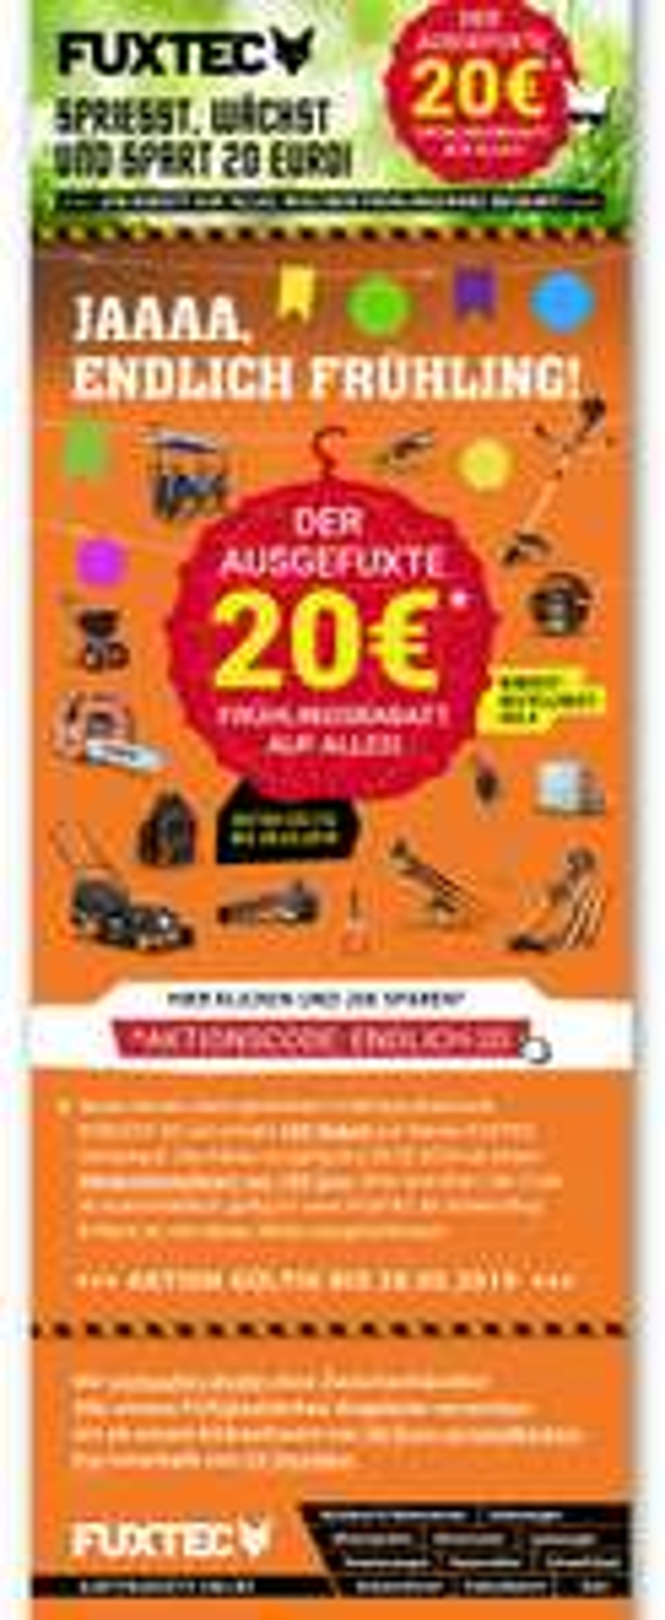 FuxTec.de 20€ Gutschein